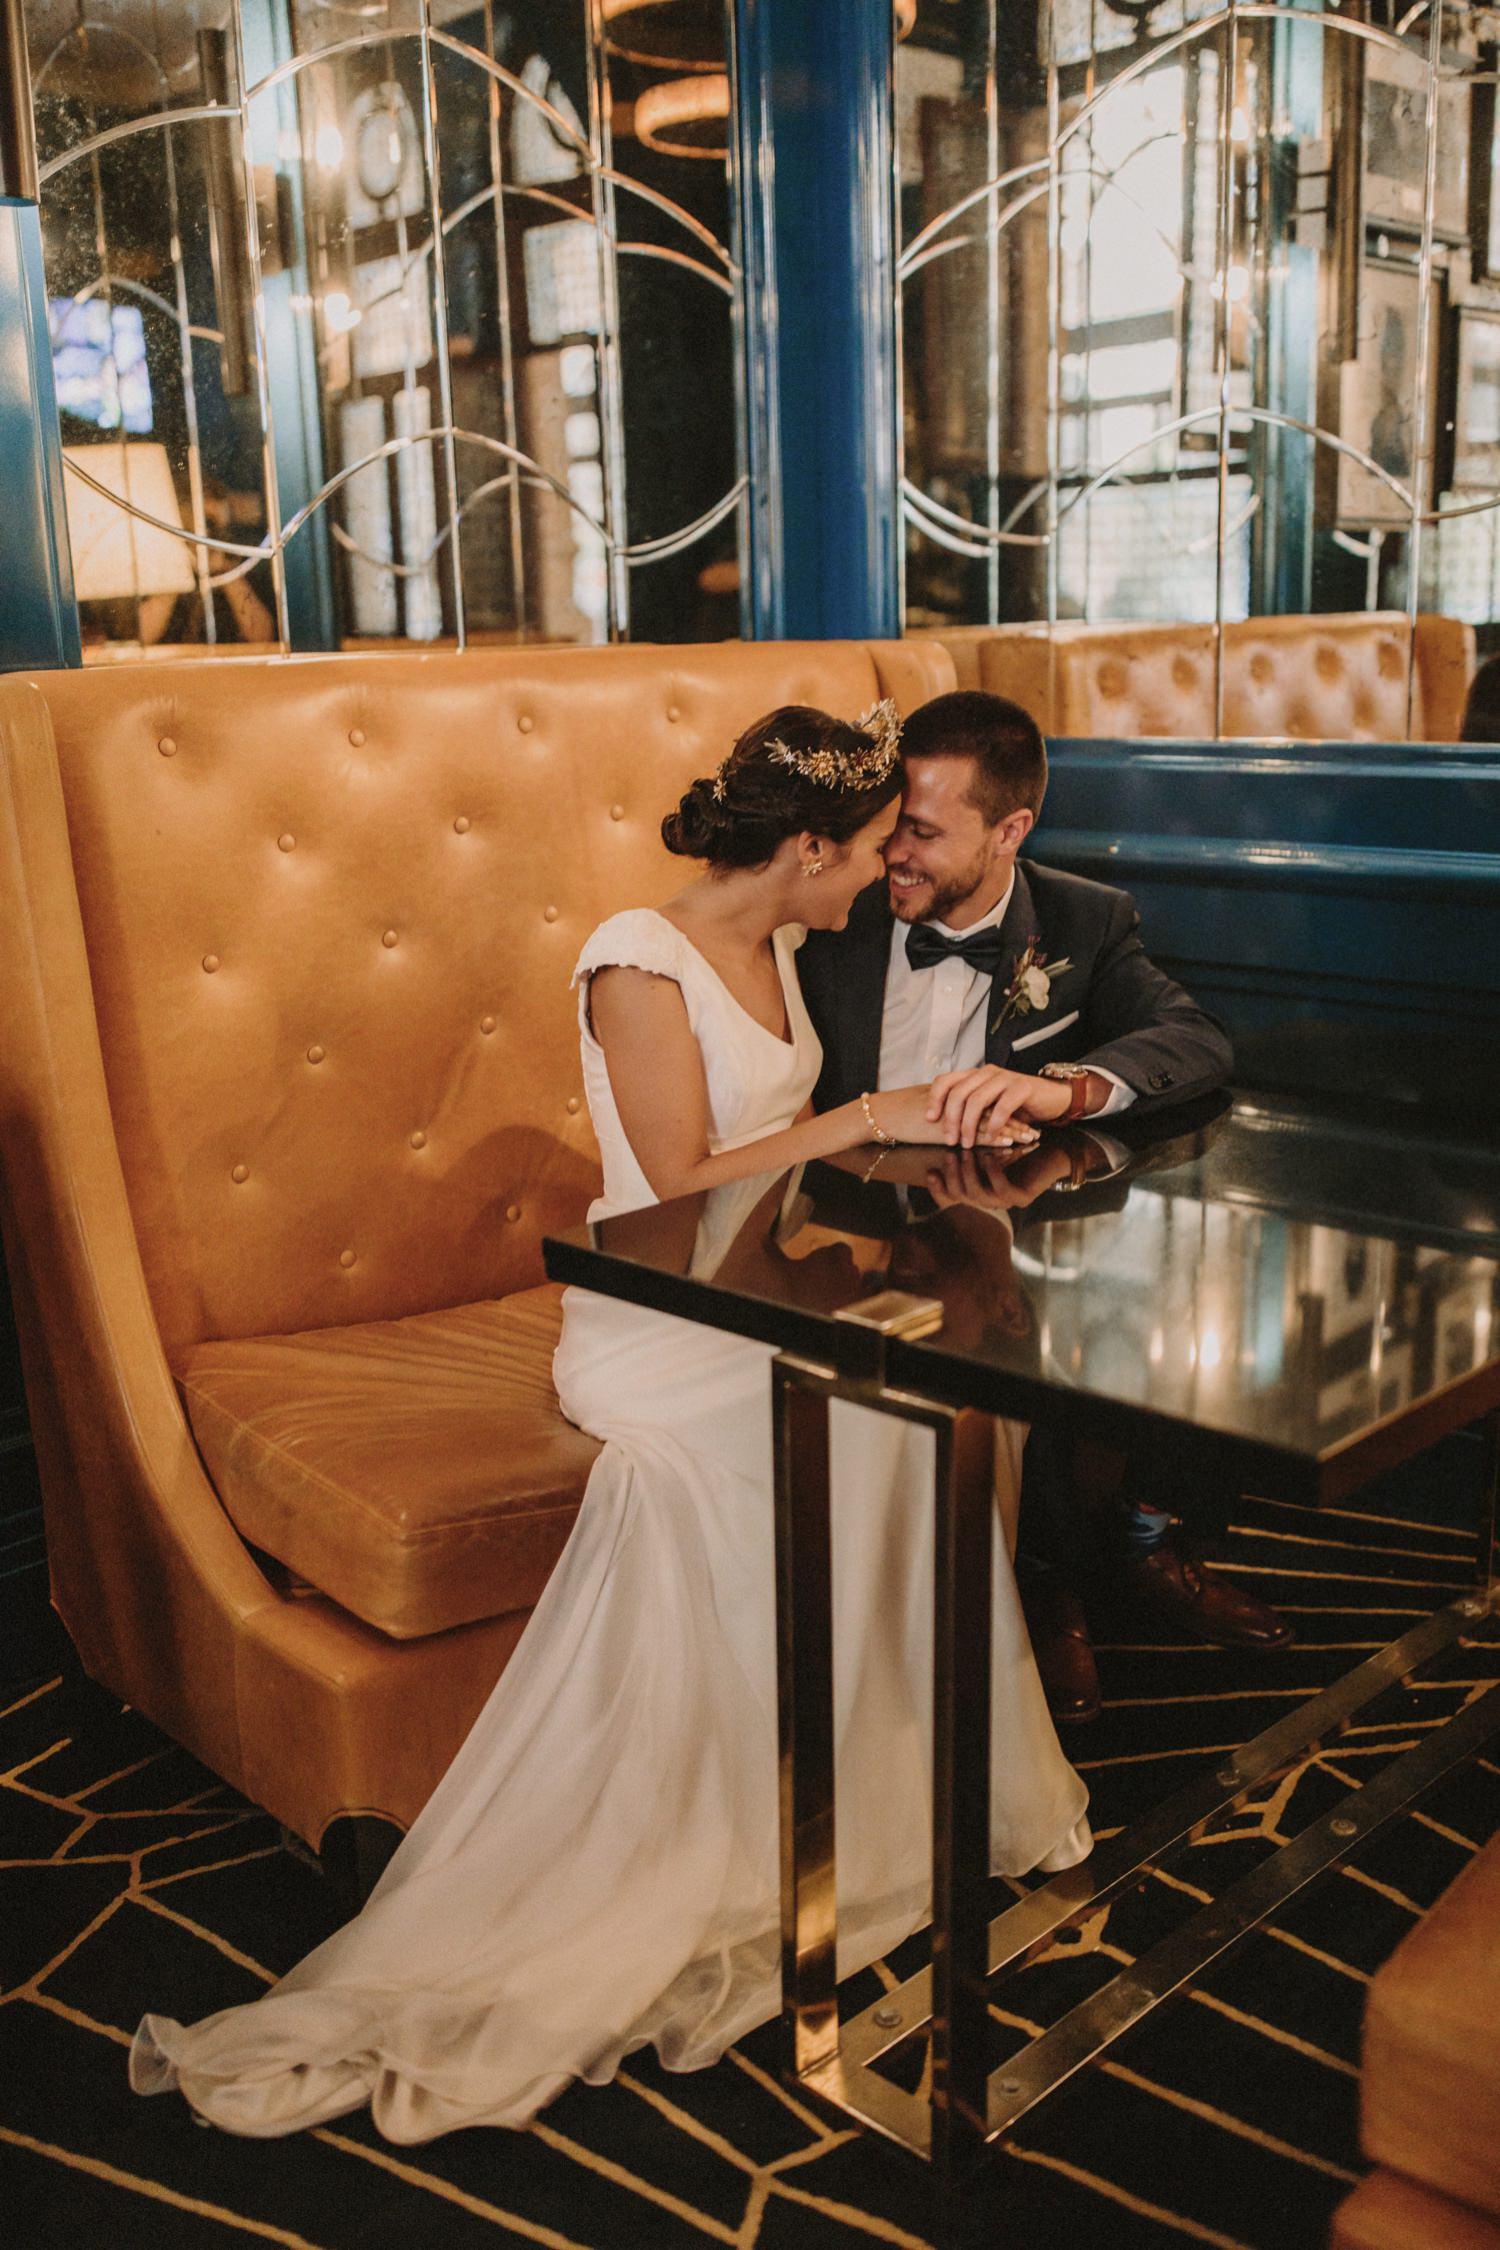 061_wedding-ernestovillalba-maria-daniel-3631-ASE.jpg